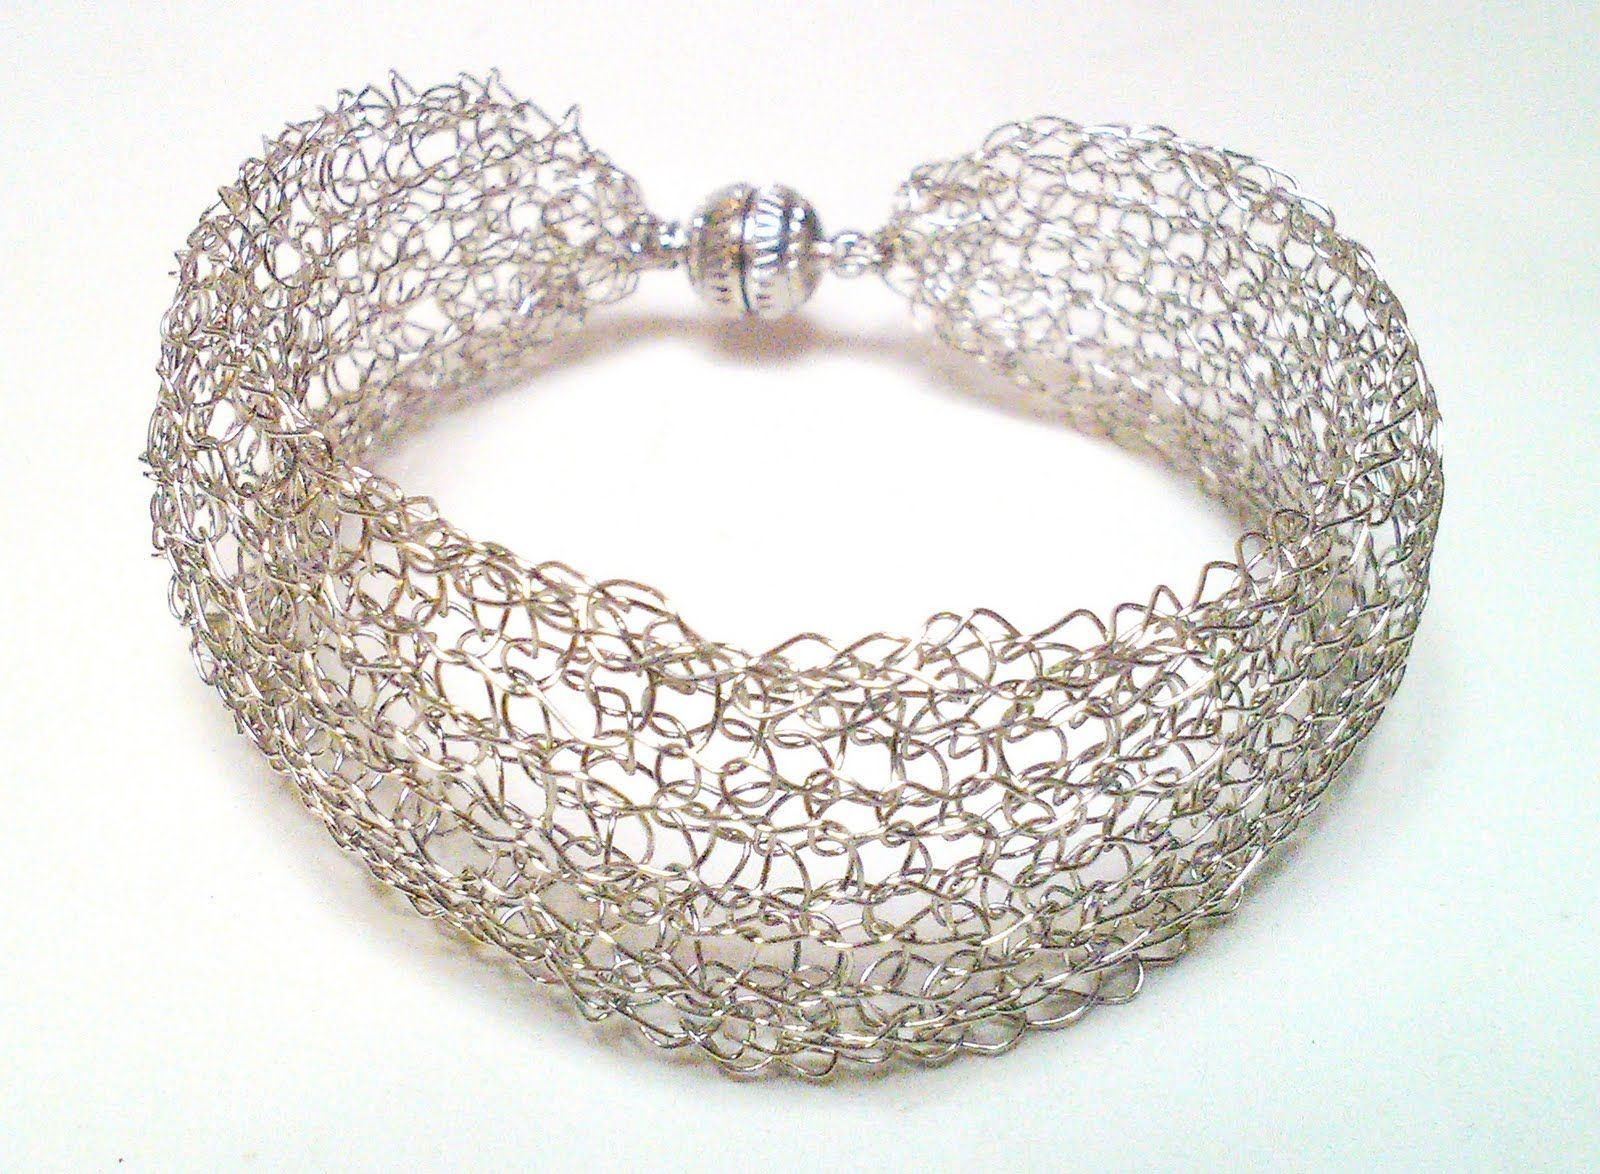 How to Crochet Jewelry Patterns | Bead Crochet Gallery: Bead Crochet ...